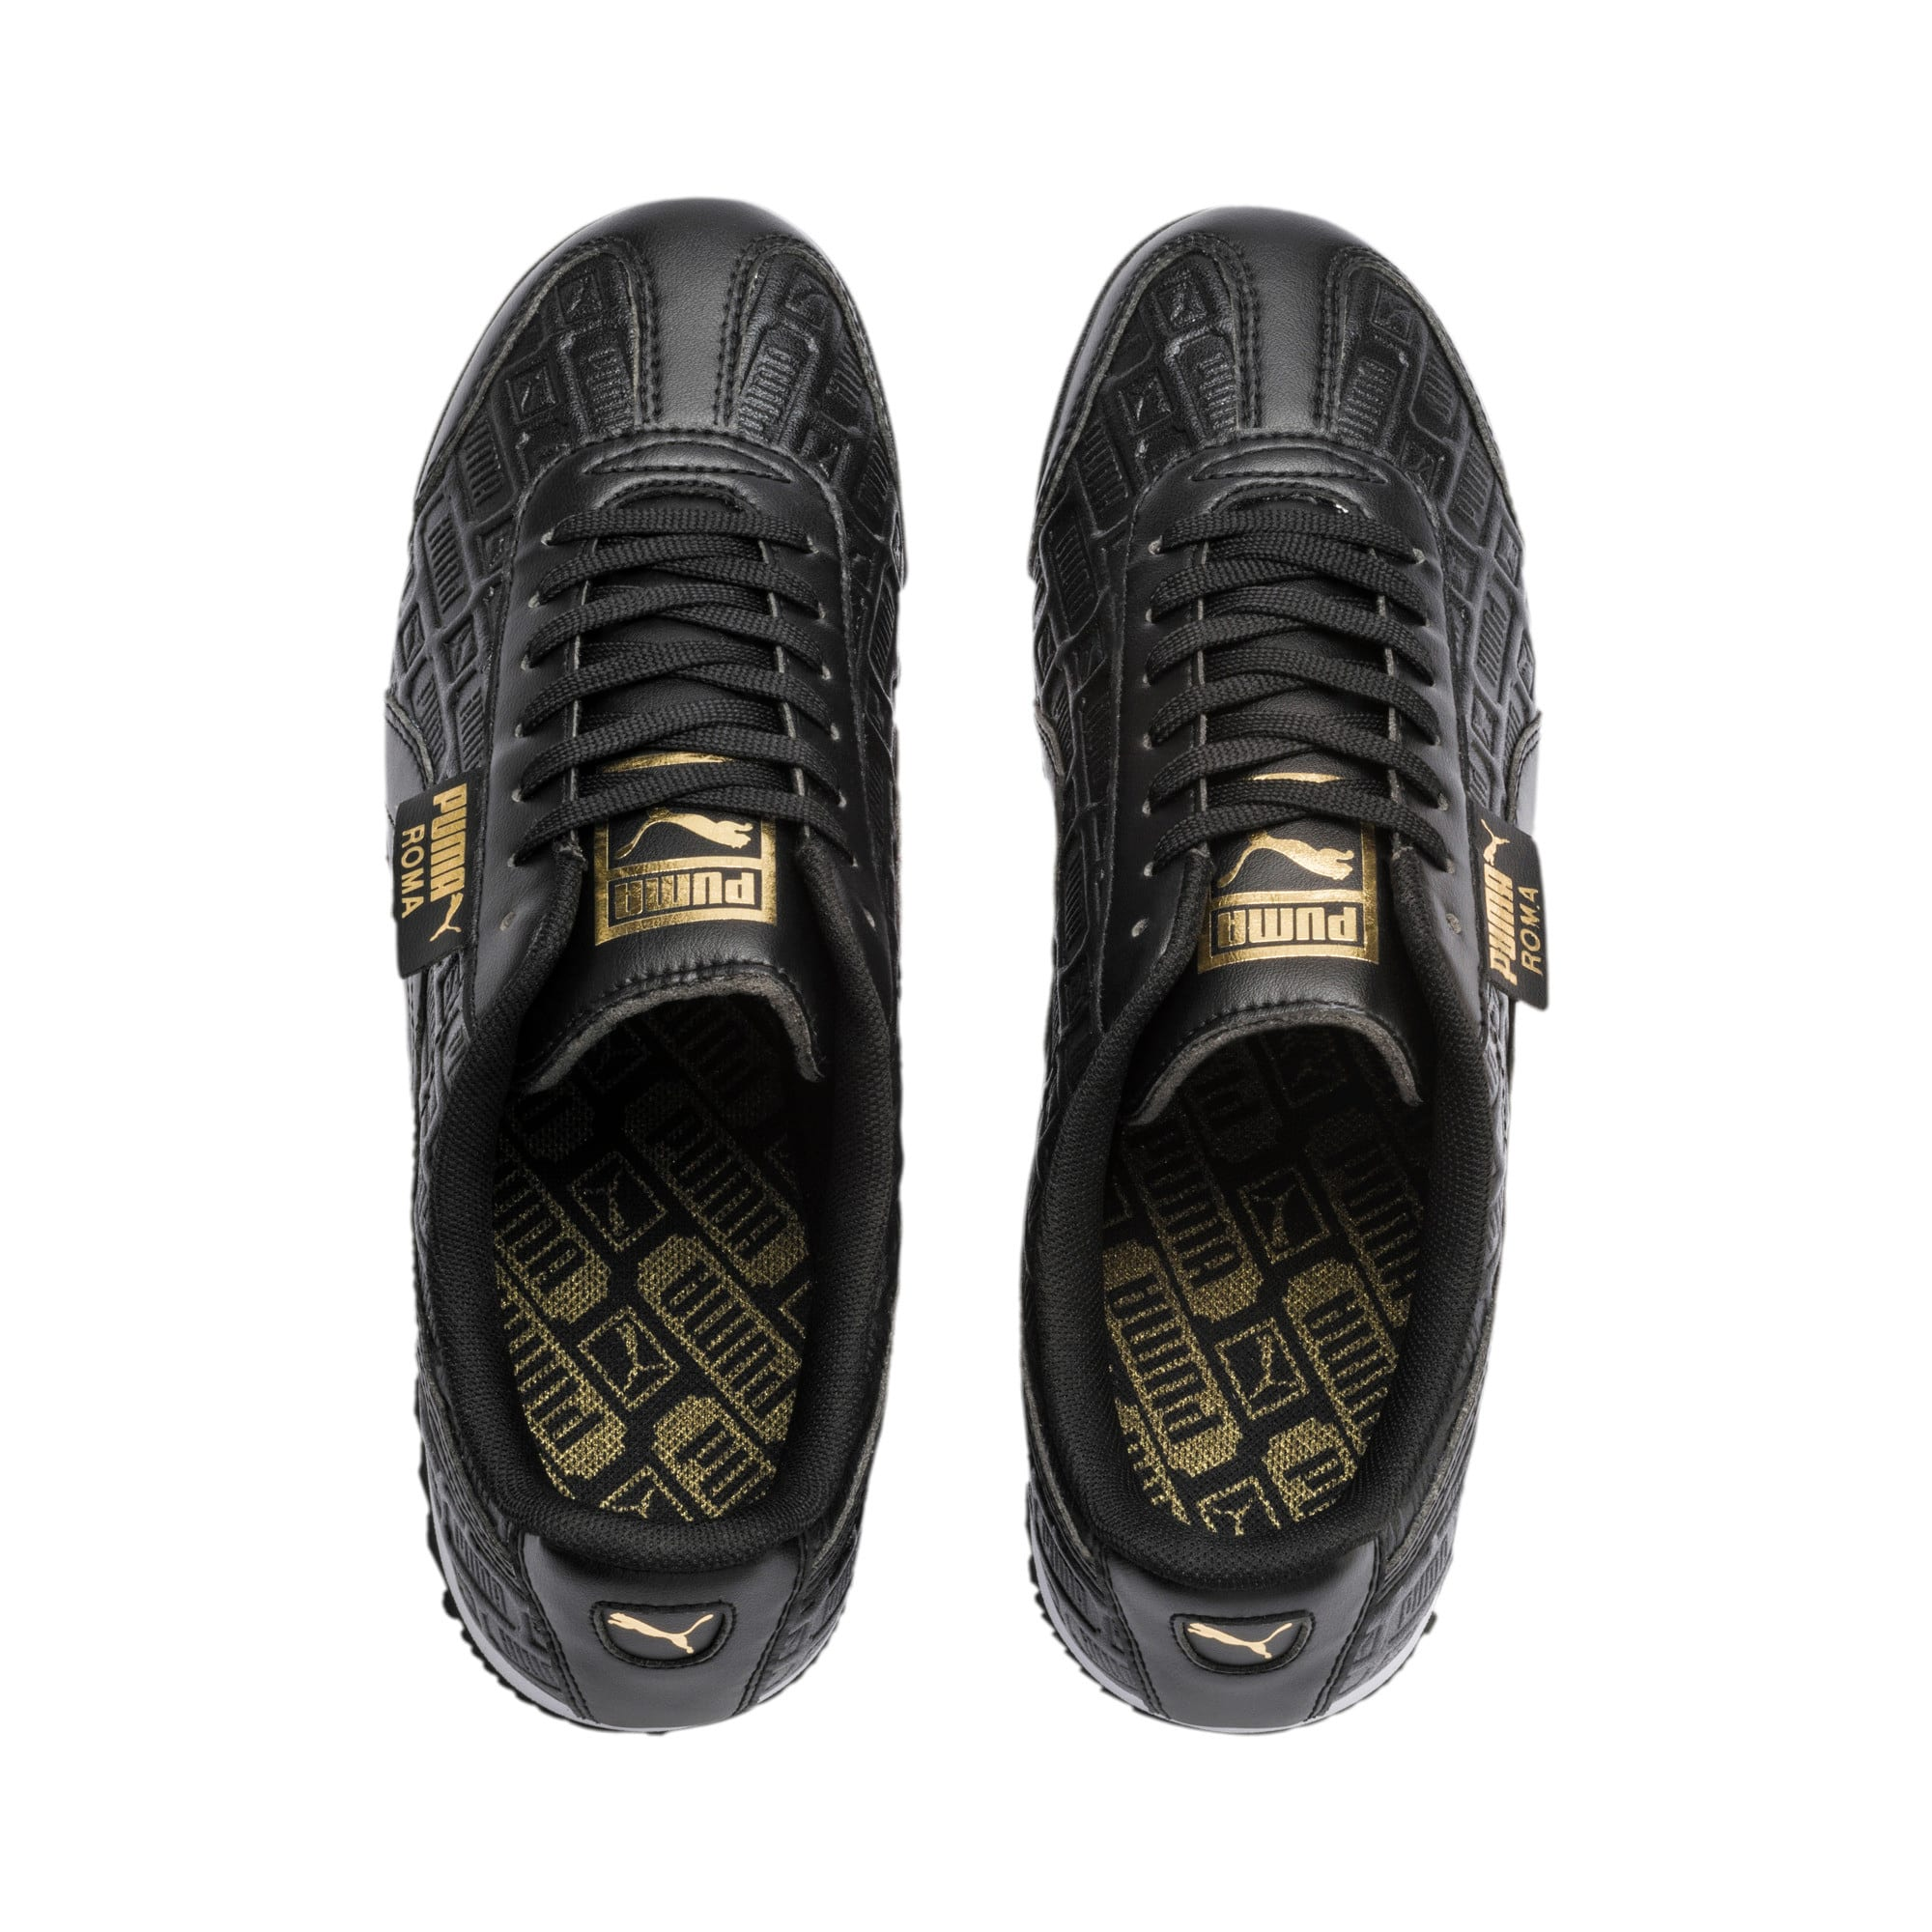 Thumbnail 7 of Roma Reinvent Women's Sneakers, Puma Black-Puma Team Gold, medium